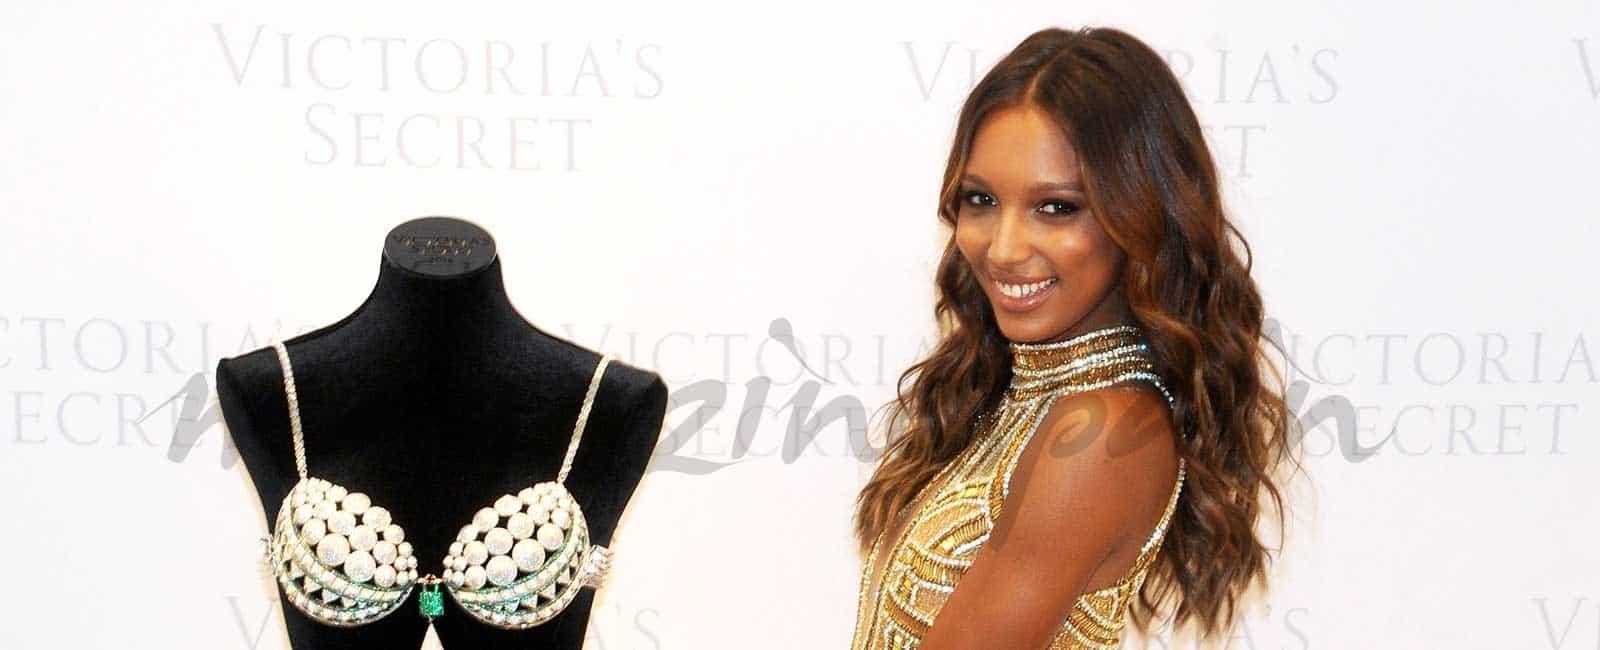 Jasmine Tookes presenta el sujetador joya de Victoria's Secret